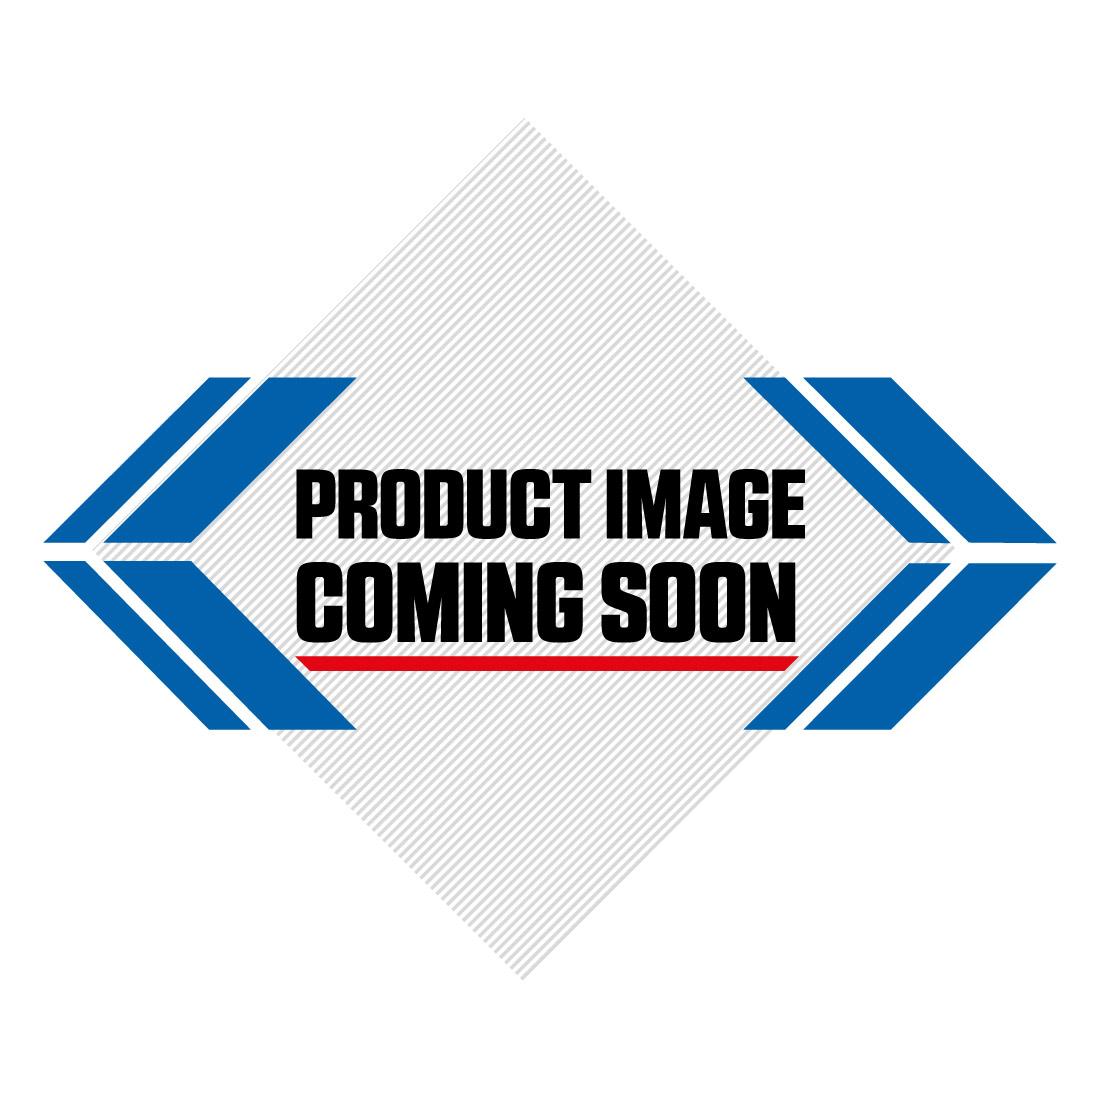 DJI Mavic Pro Platinum Drone Image-1